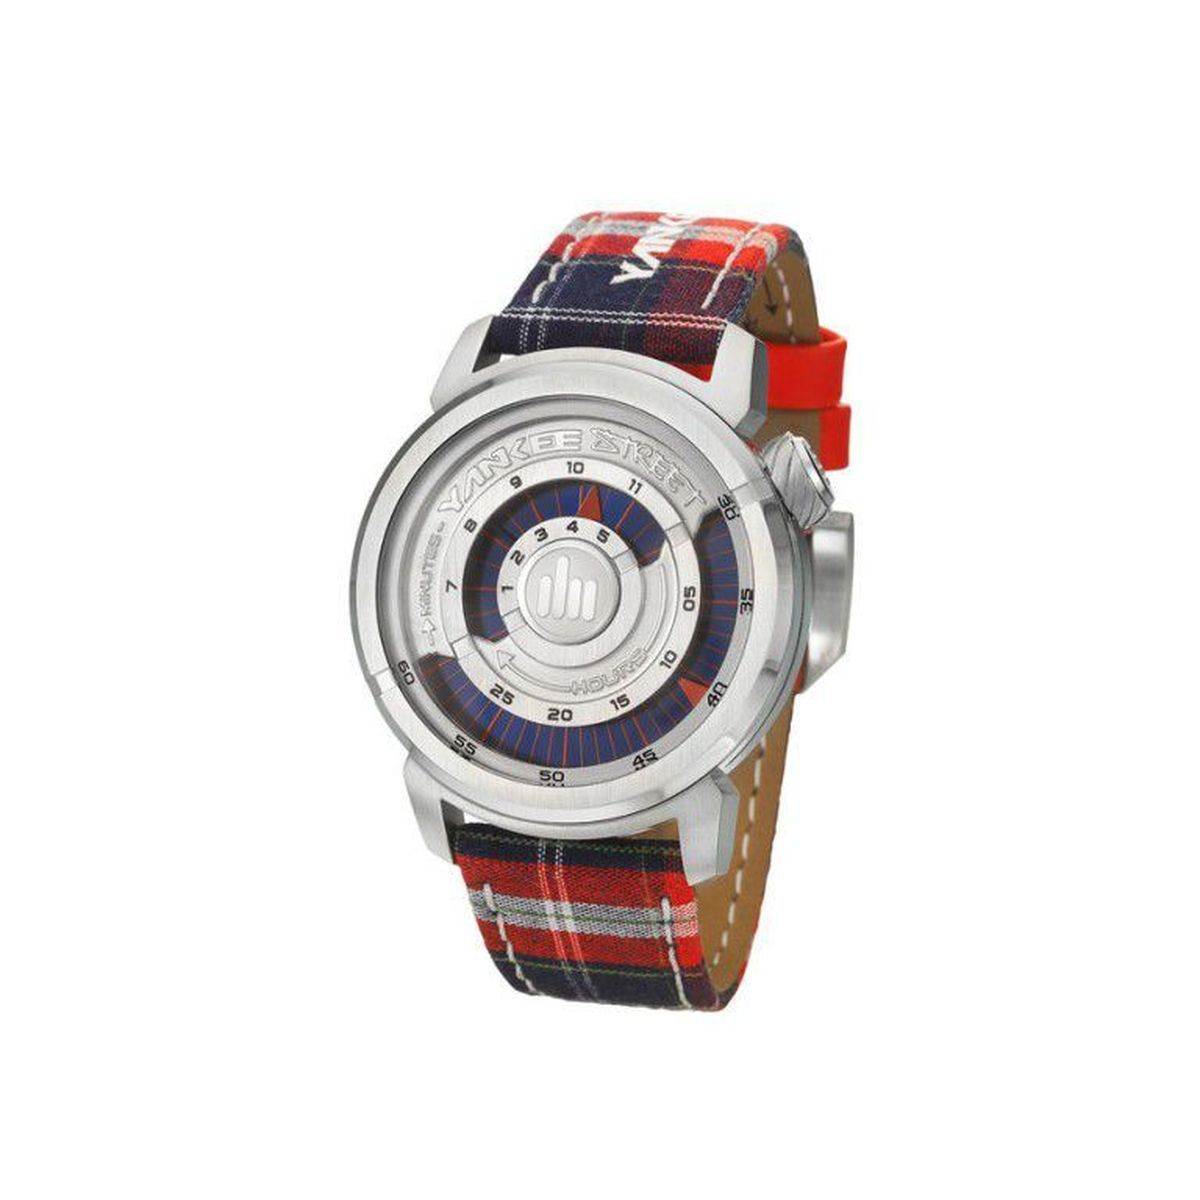 Relógio de Pulso Feminino Urban YS38203V